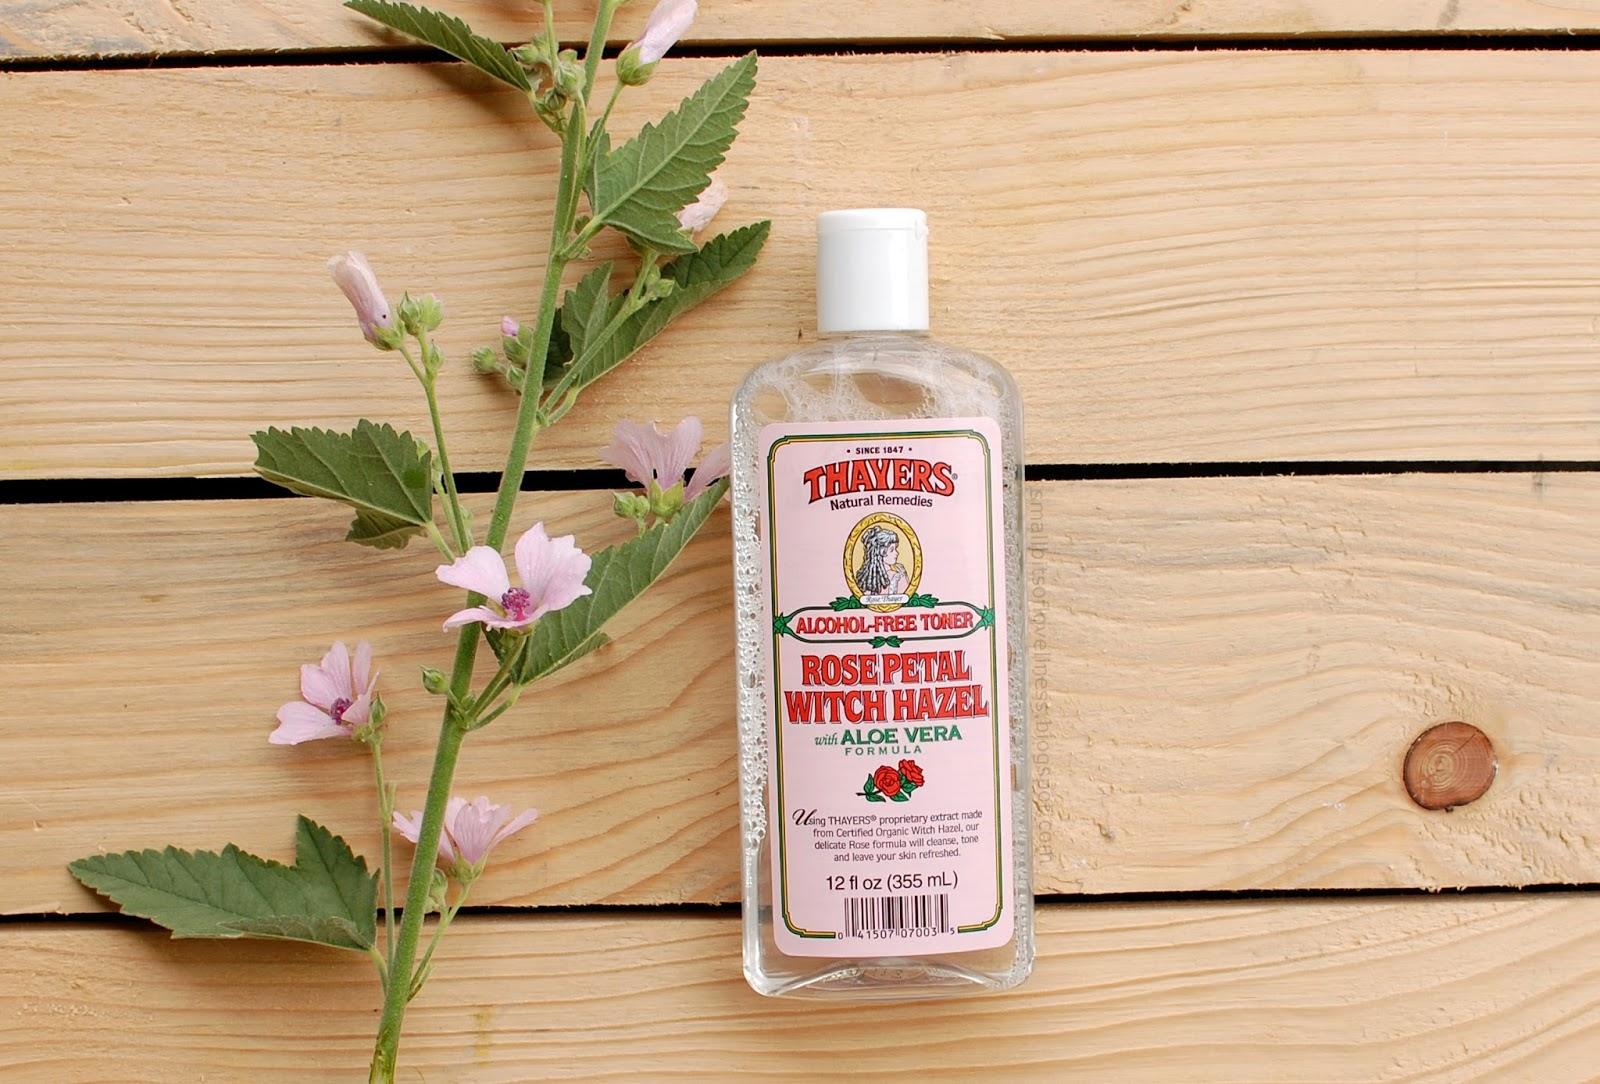 Thayers Alcohol-Free Toner Rose Petal Witch Hazel with Aloe Vera